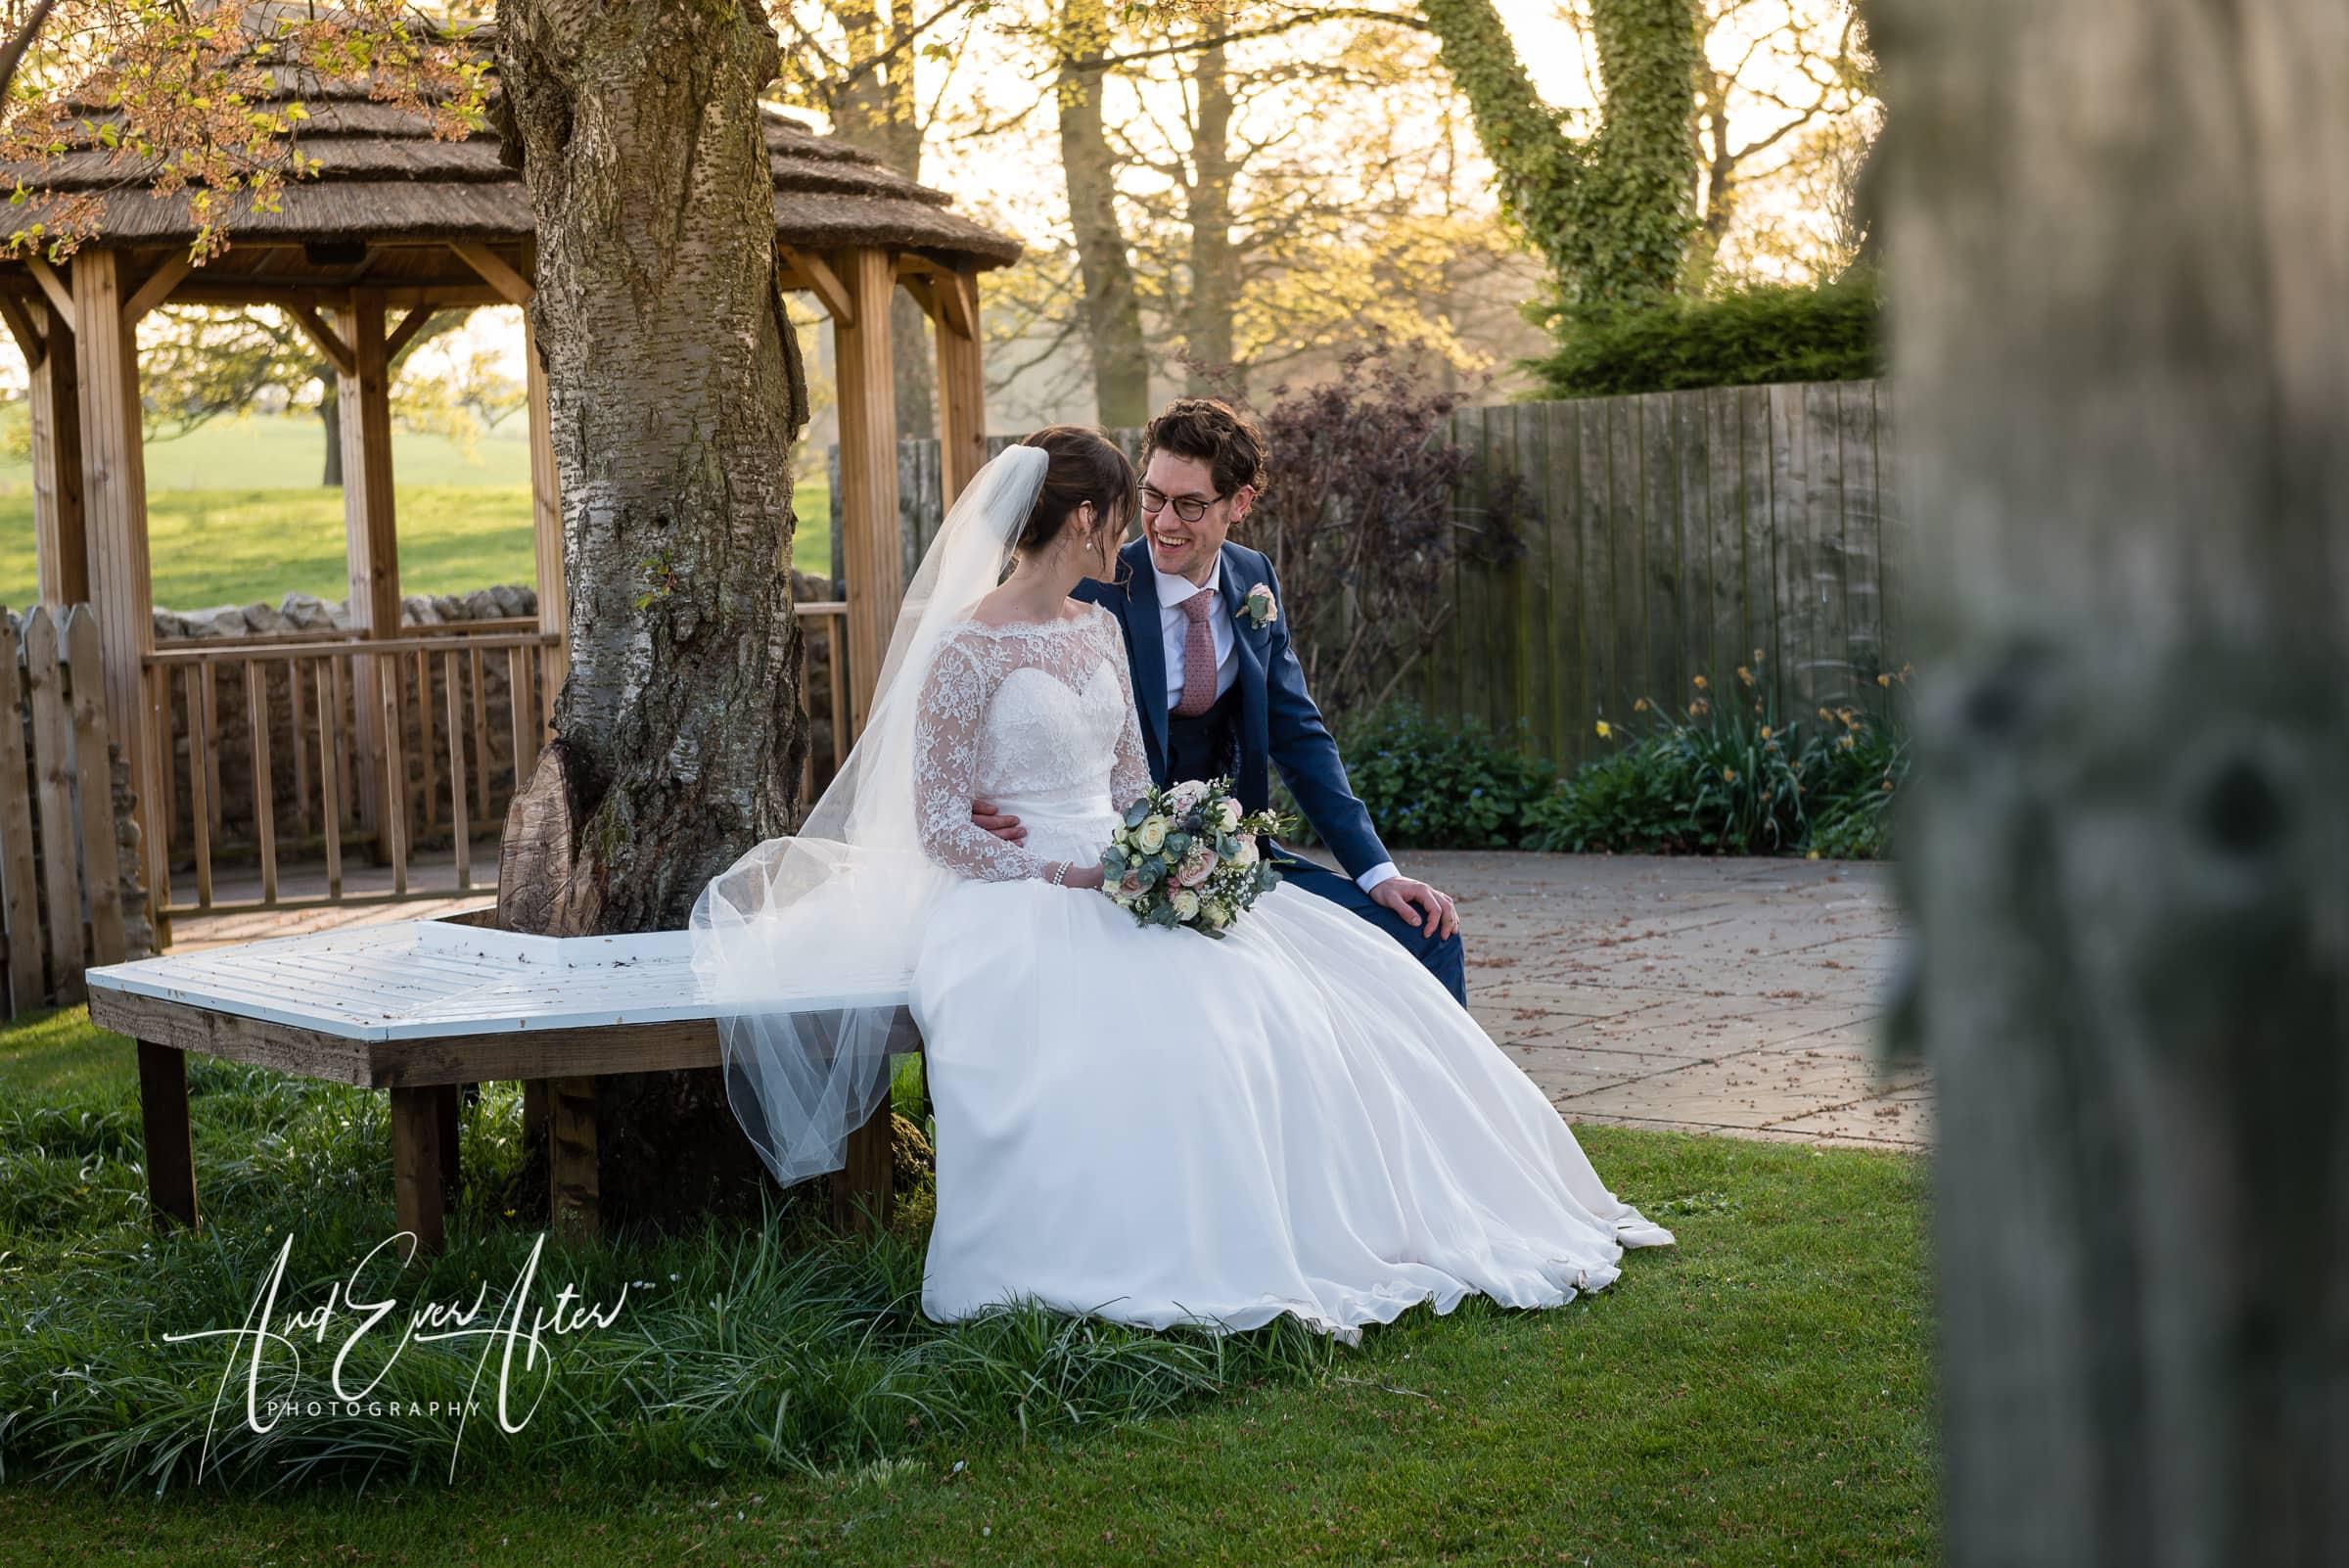 Wedding Photography, The Morritt Hotel